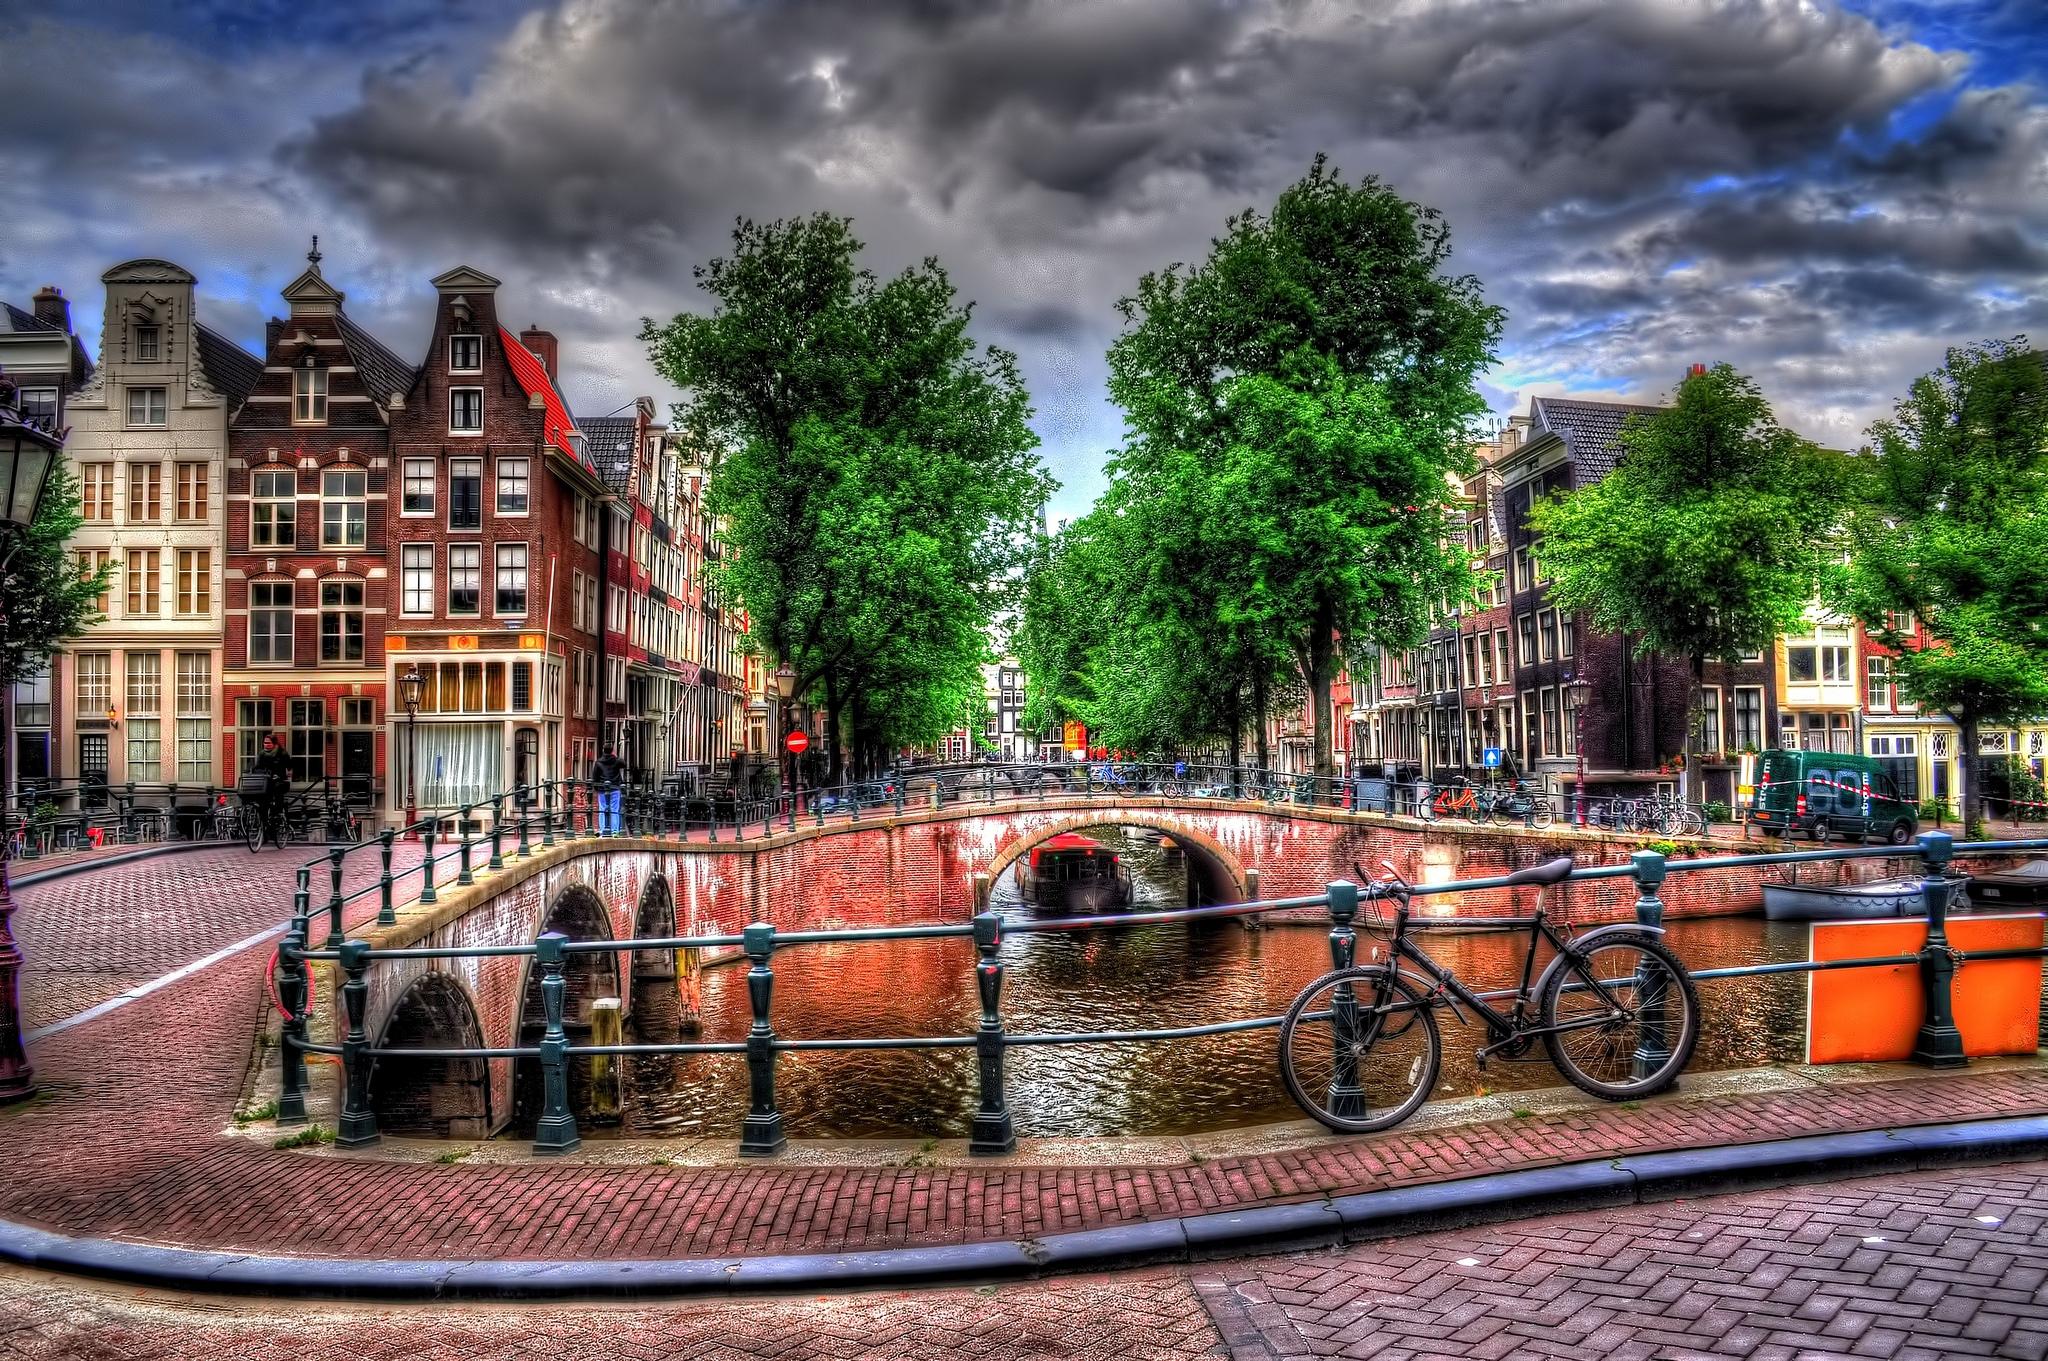 трудно фото амстердама в хорошем качестве лето корфу